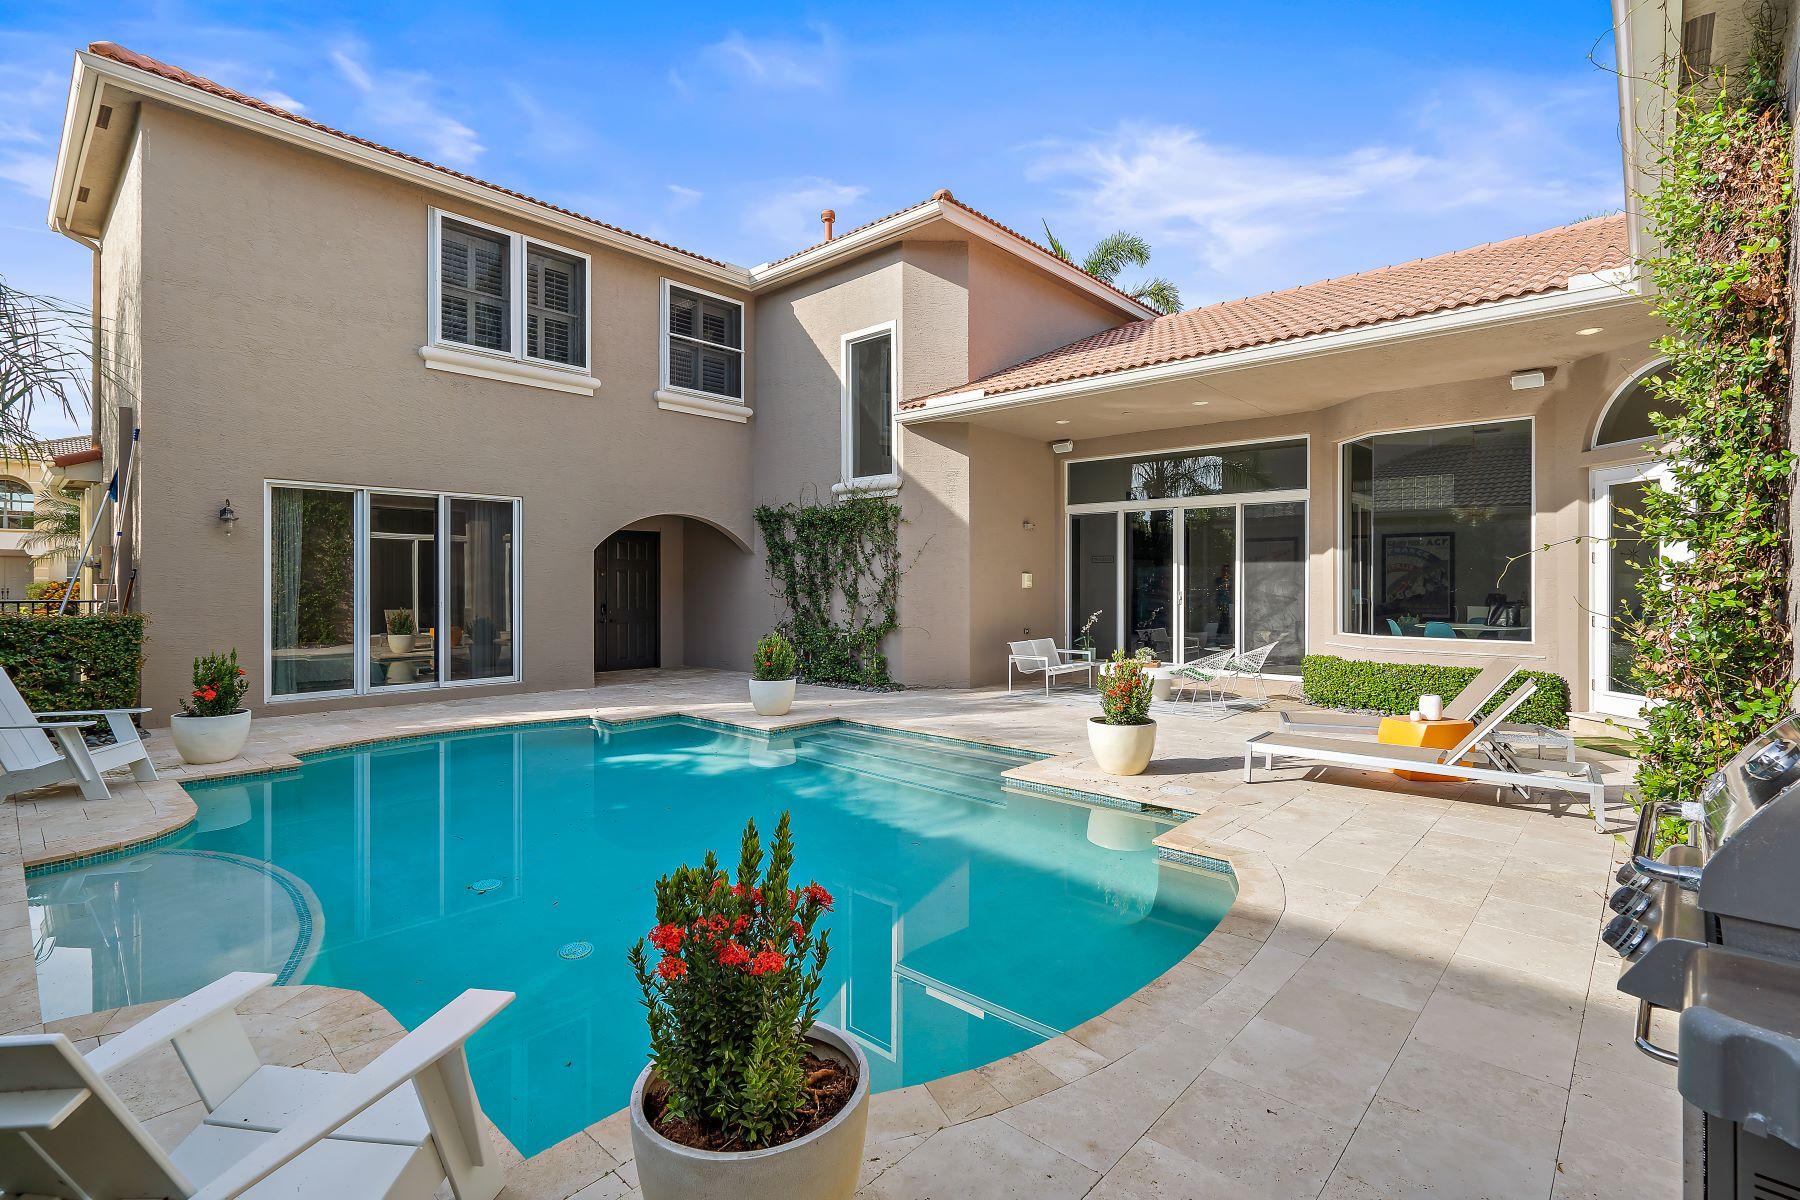 Single Family Homes for Sale at 173 Sedona Way Se Palm Beach Gardens, Florida 33418 United States